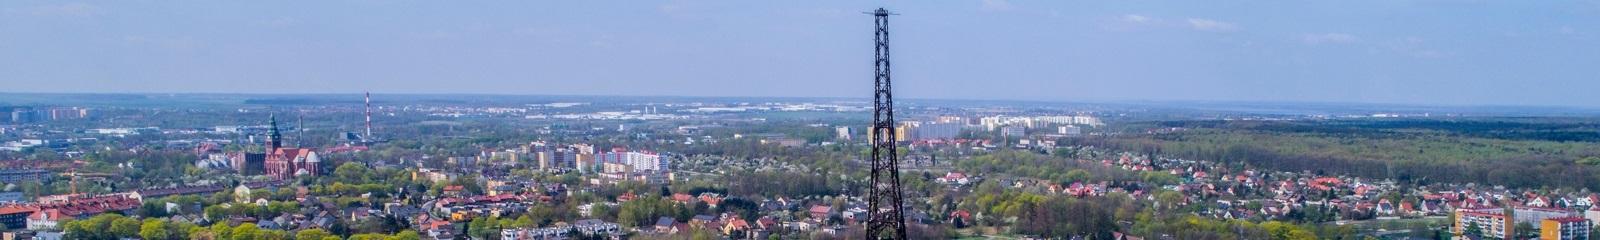 Radiostacja na tle miasta